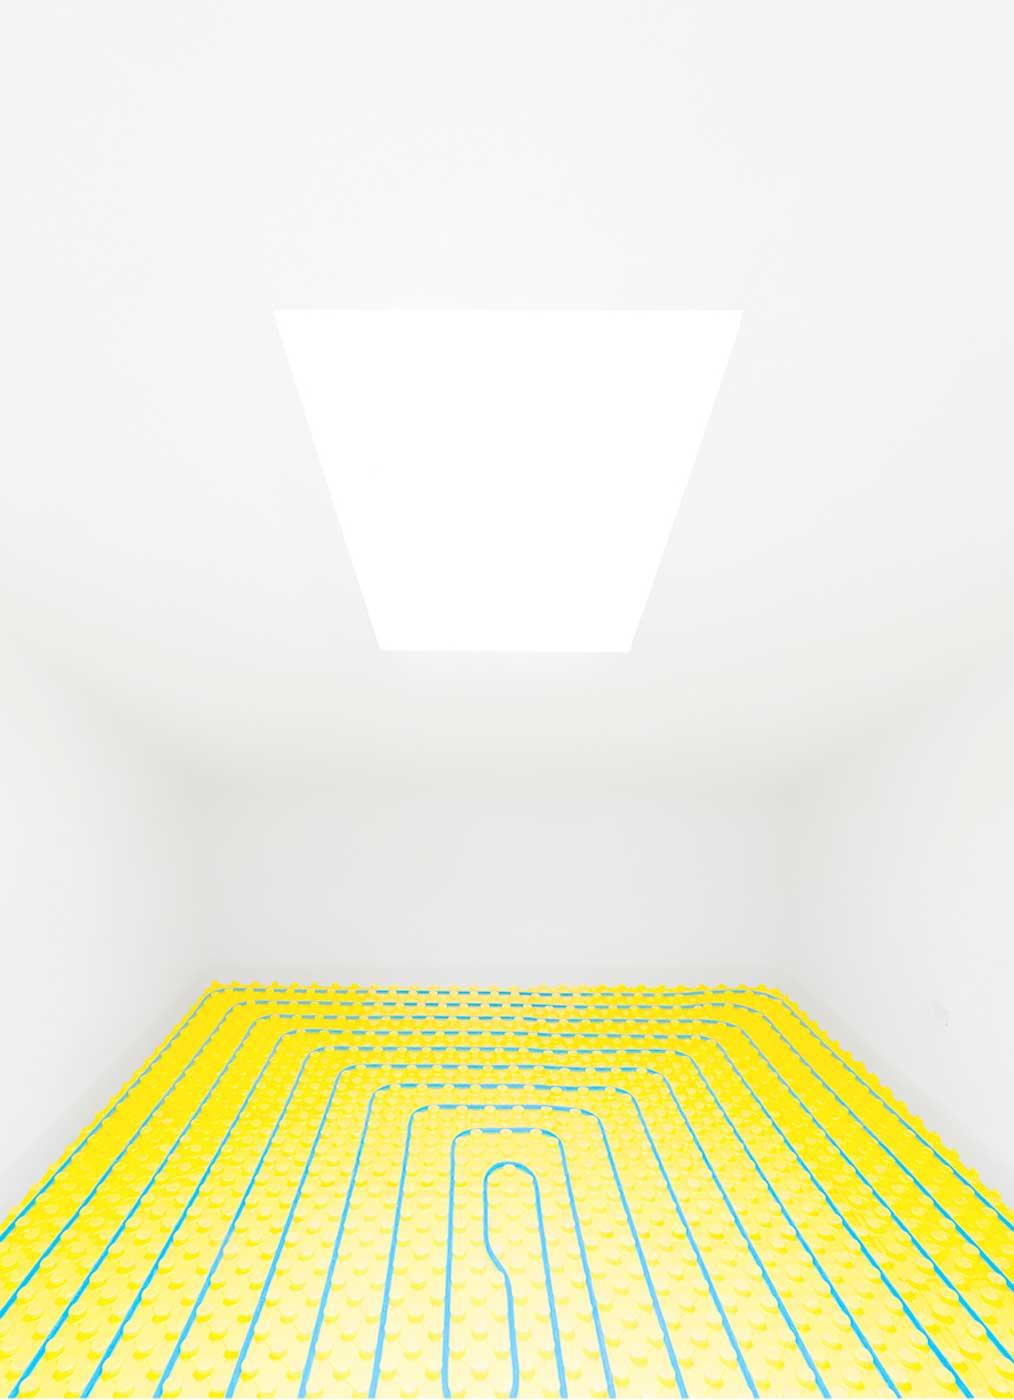 Luca Gilli | Bank n°5485, 2013, 58x87 cm, tirage fine art